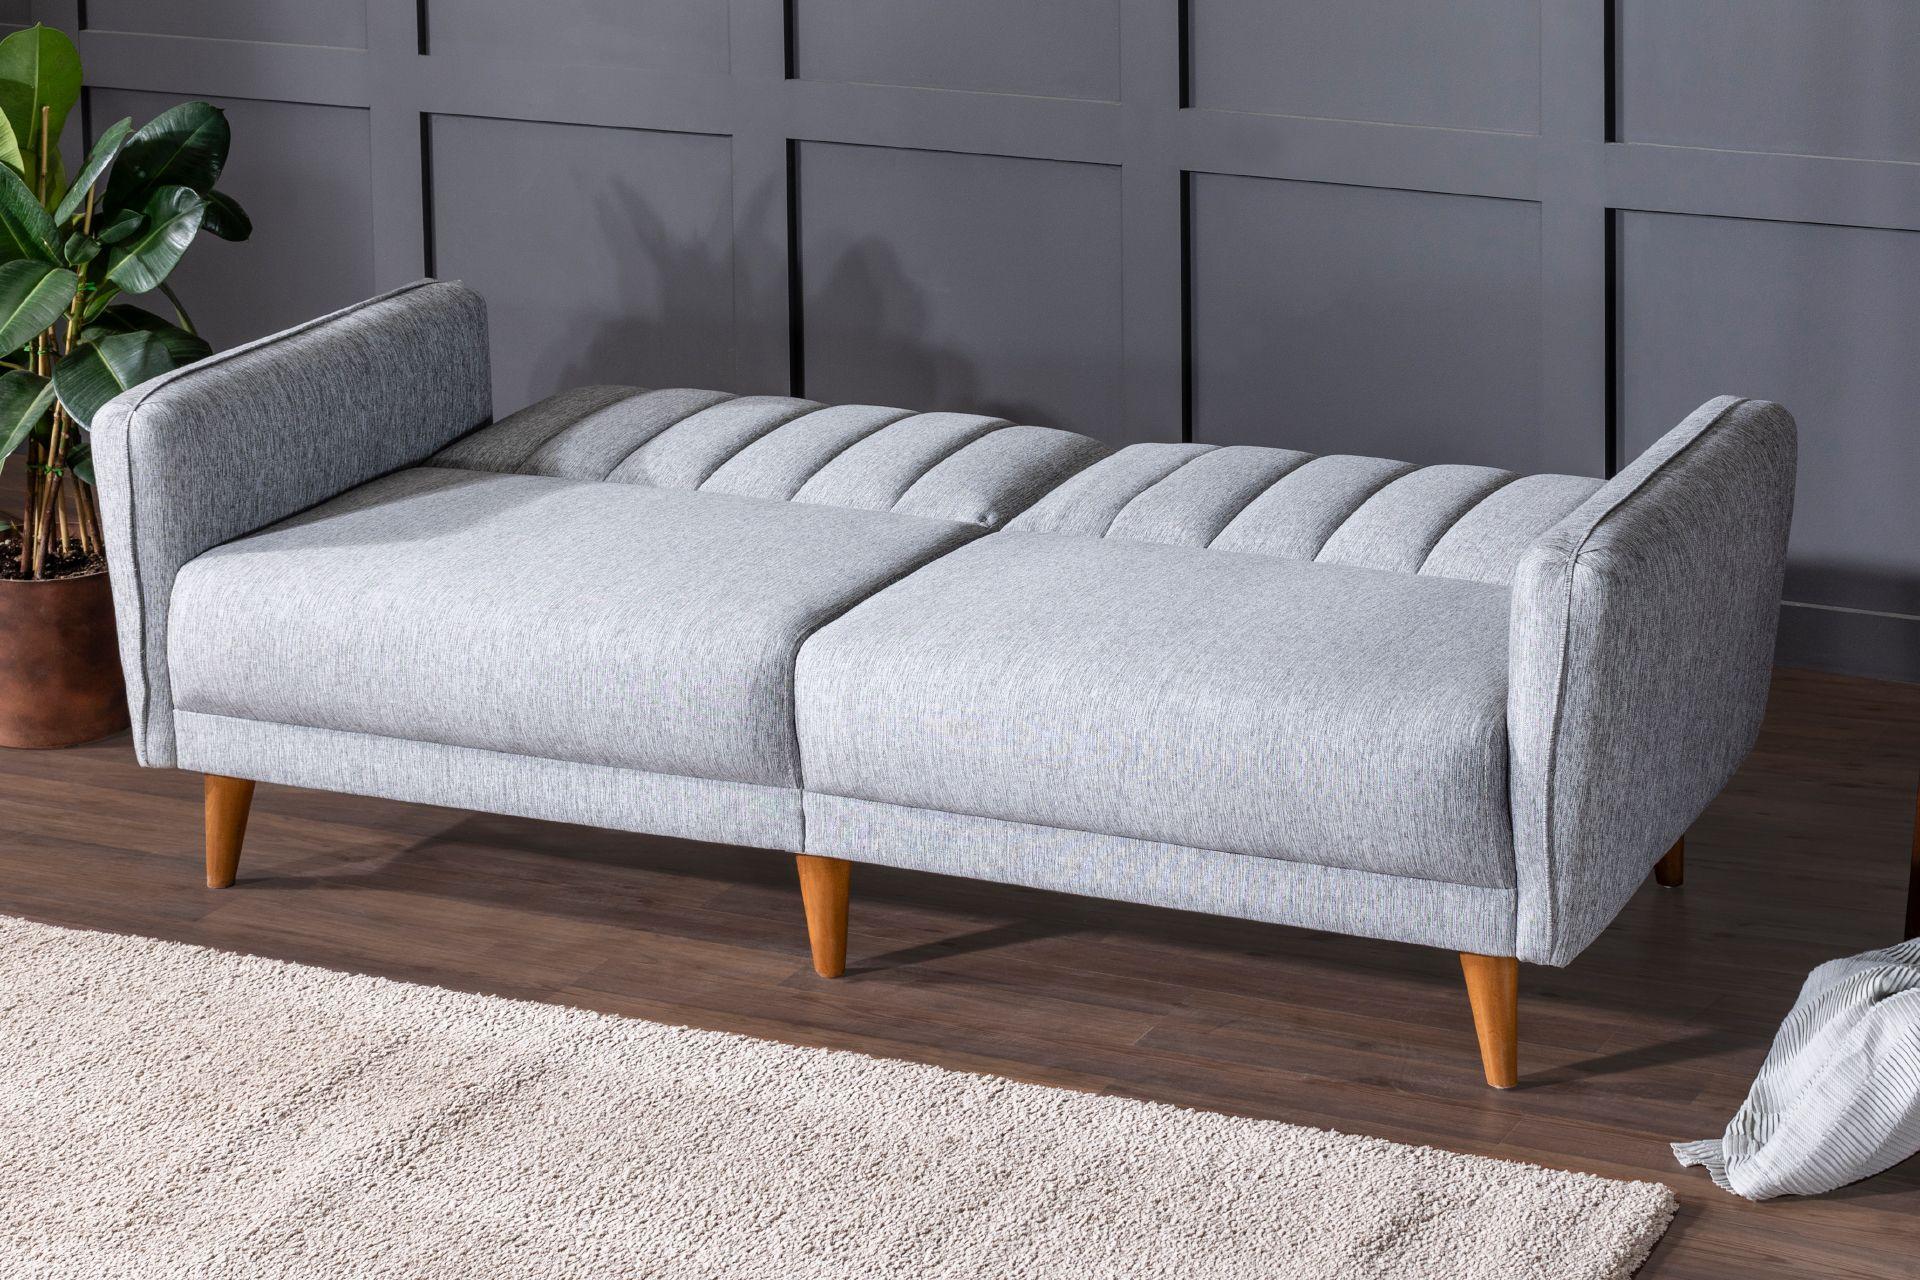 Aqua Three Seater Sofa Bed, Grey